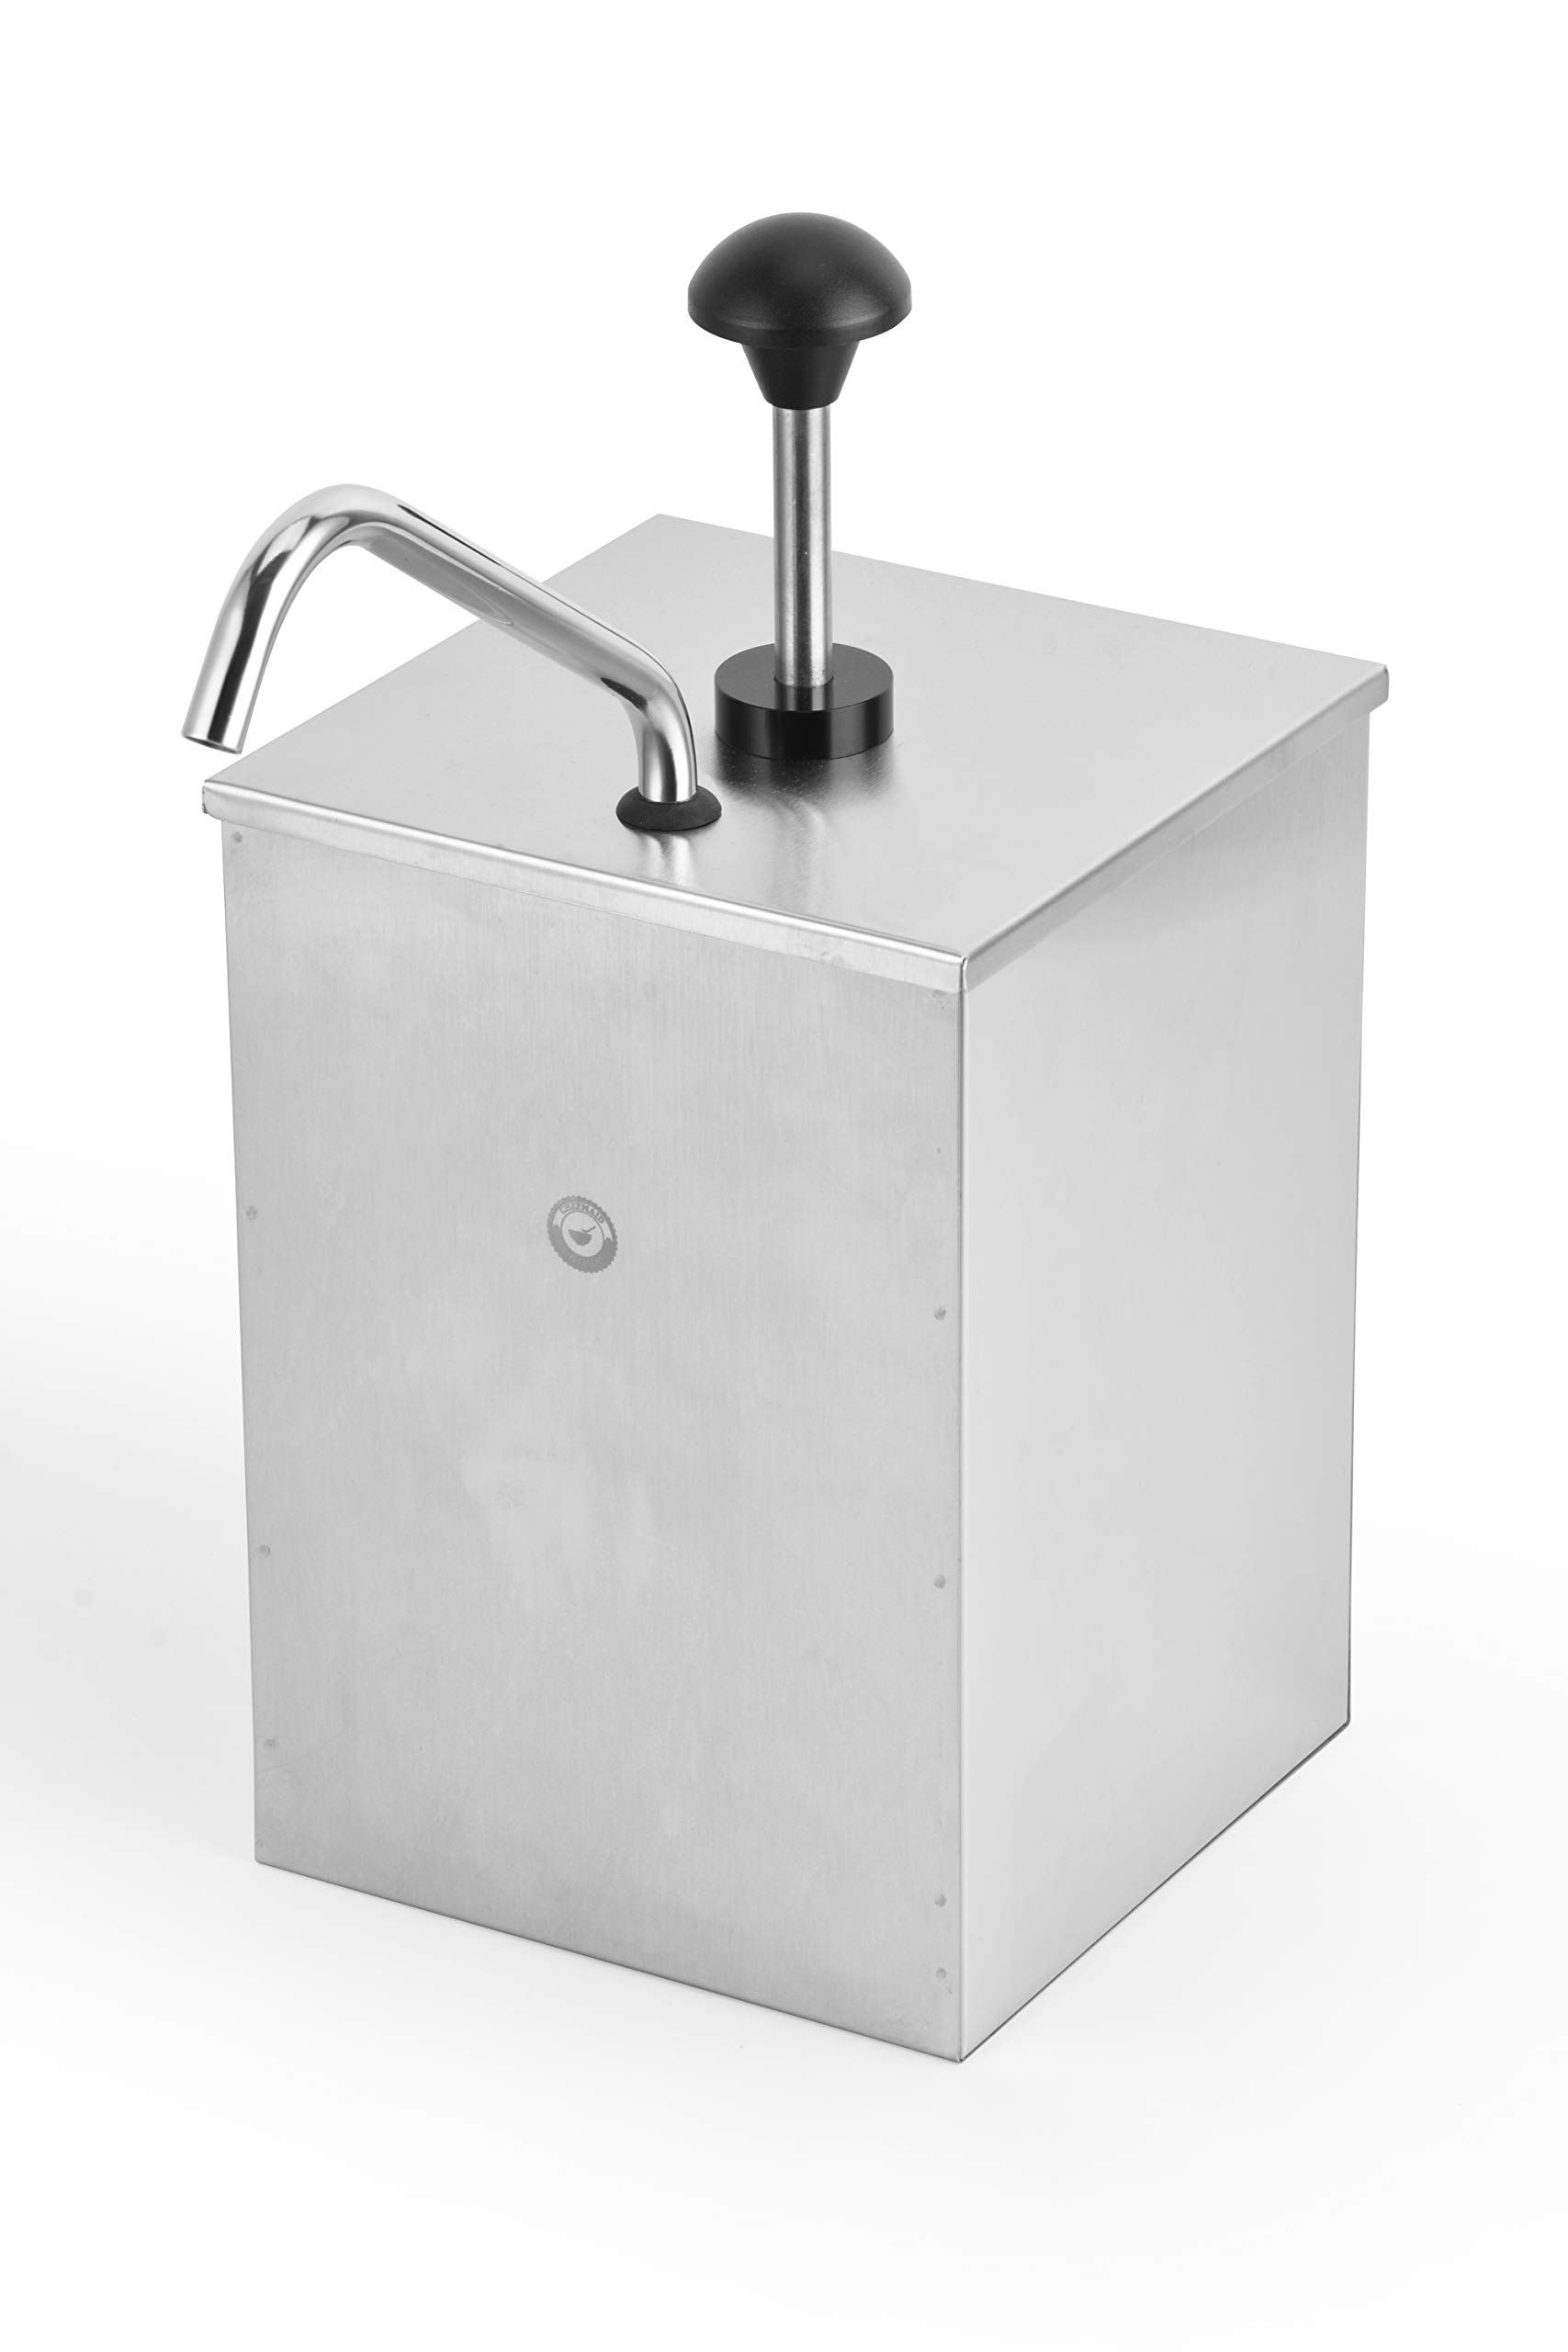 ChefMaid Stainless Steel Condiment Pump Single Head Sauce Dispenser Pump Dispense Kitchen Restaurant by ChefMaid